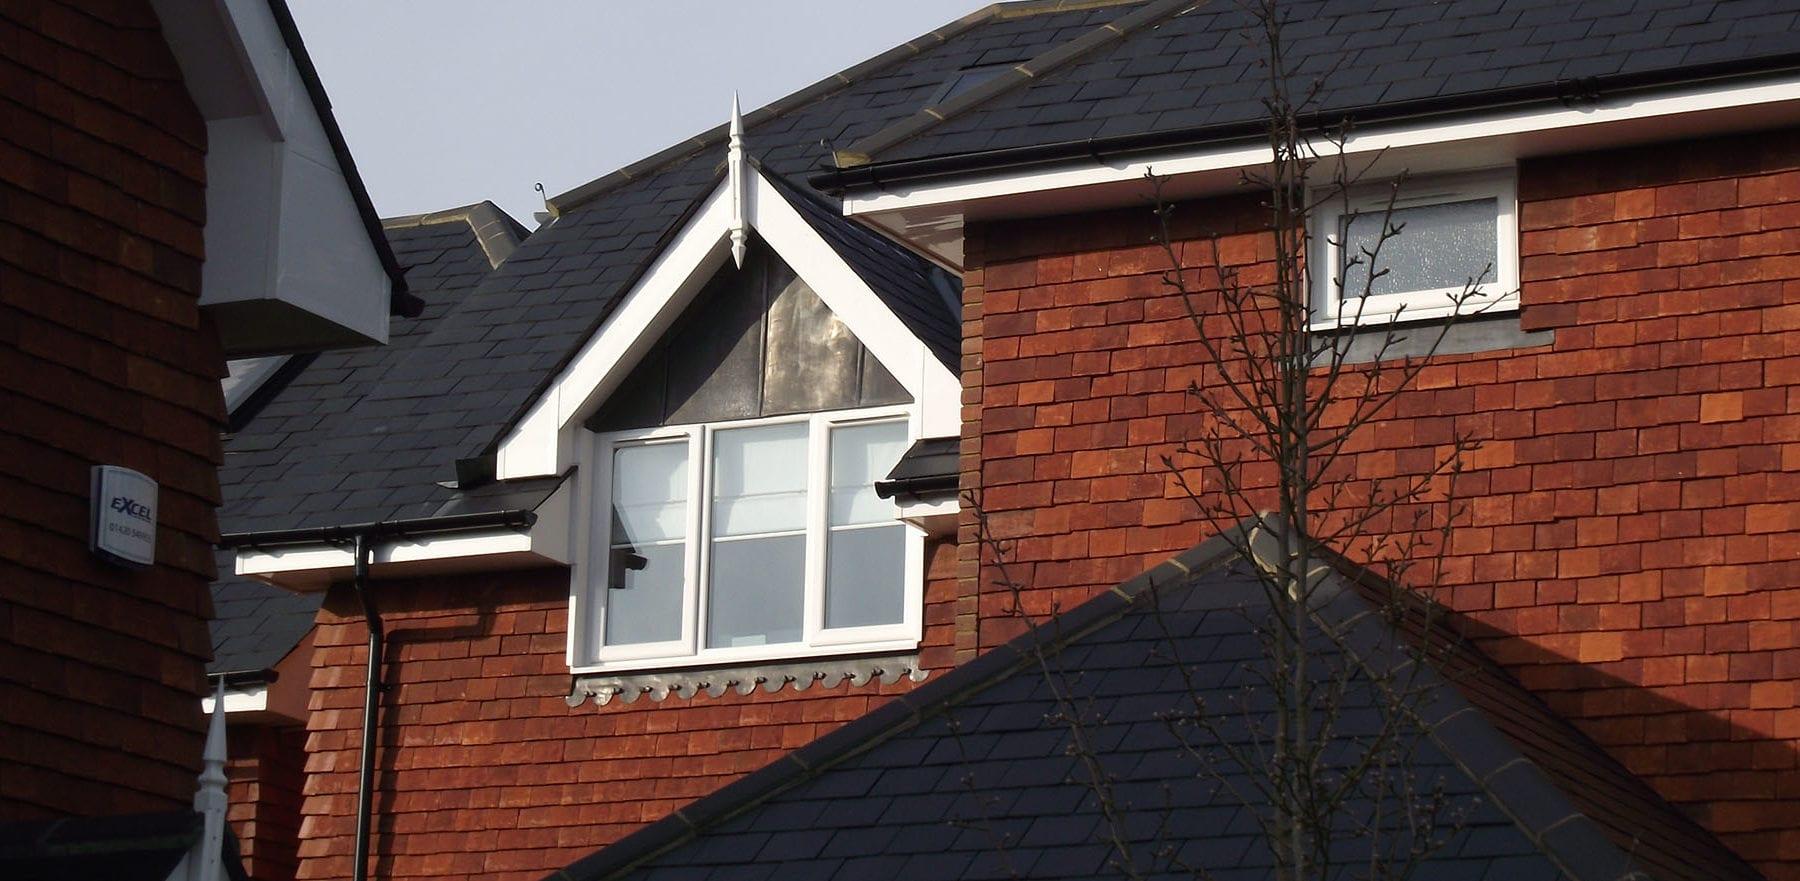 Lifestiles - Handmade Red Clay Roof Tiles - Frensham, England 2